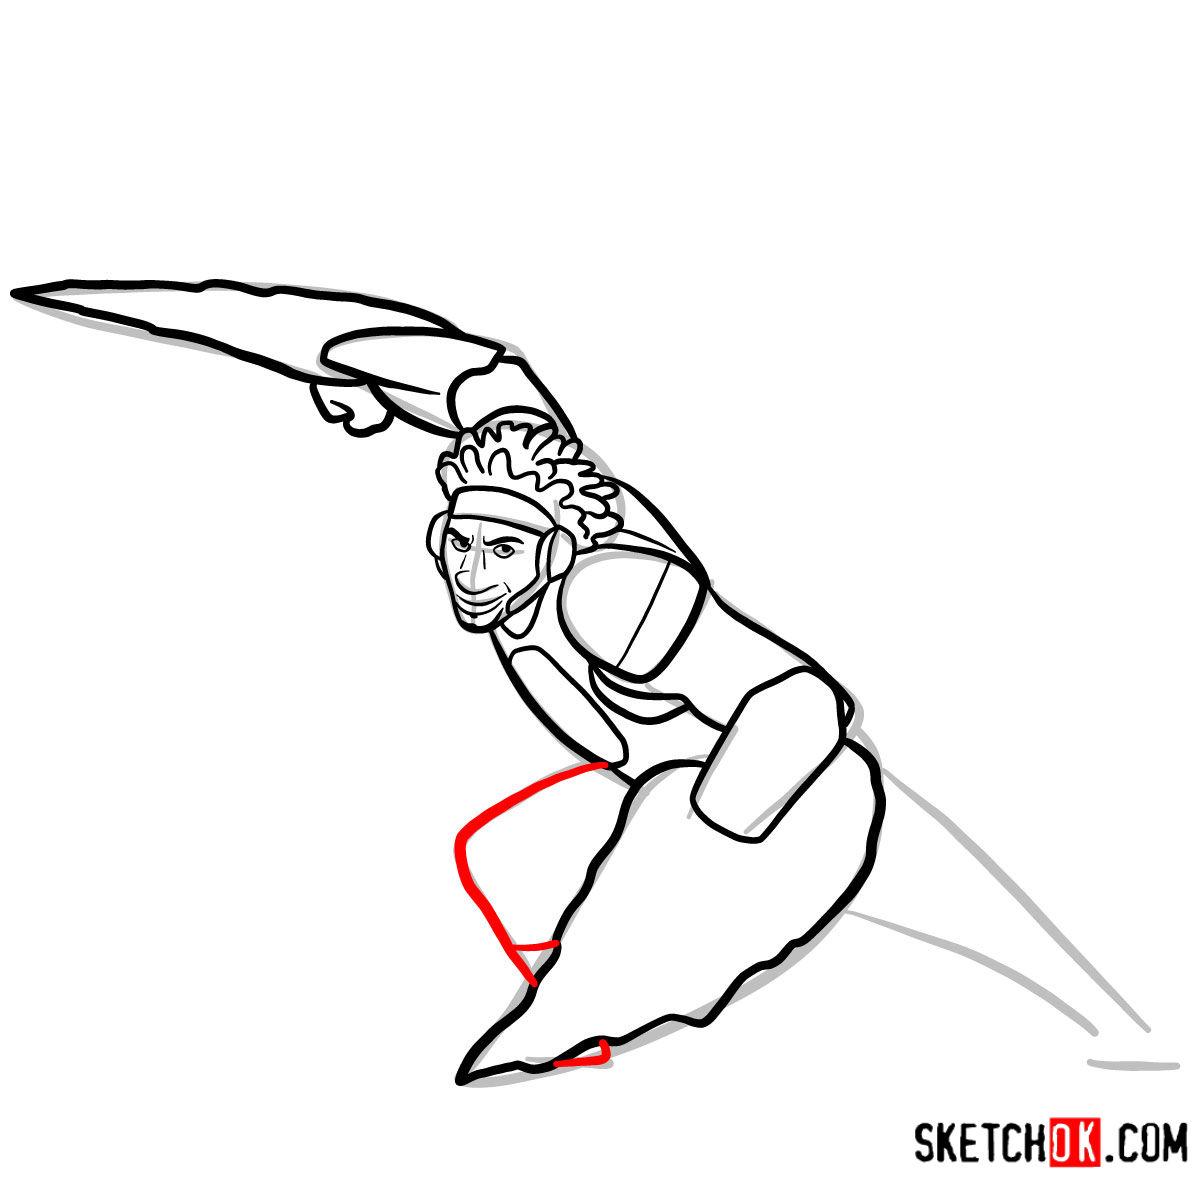 How to draw Wasabi as a superhero | Big Hero 6 - step 10